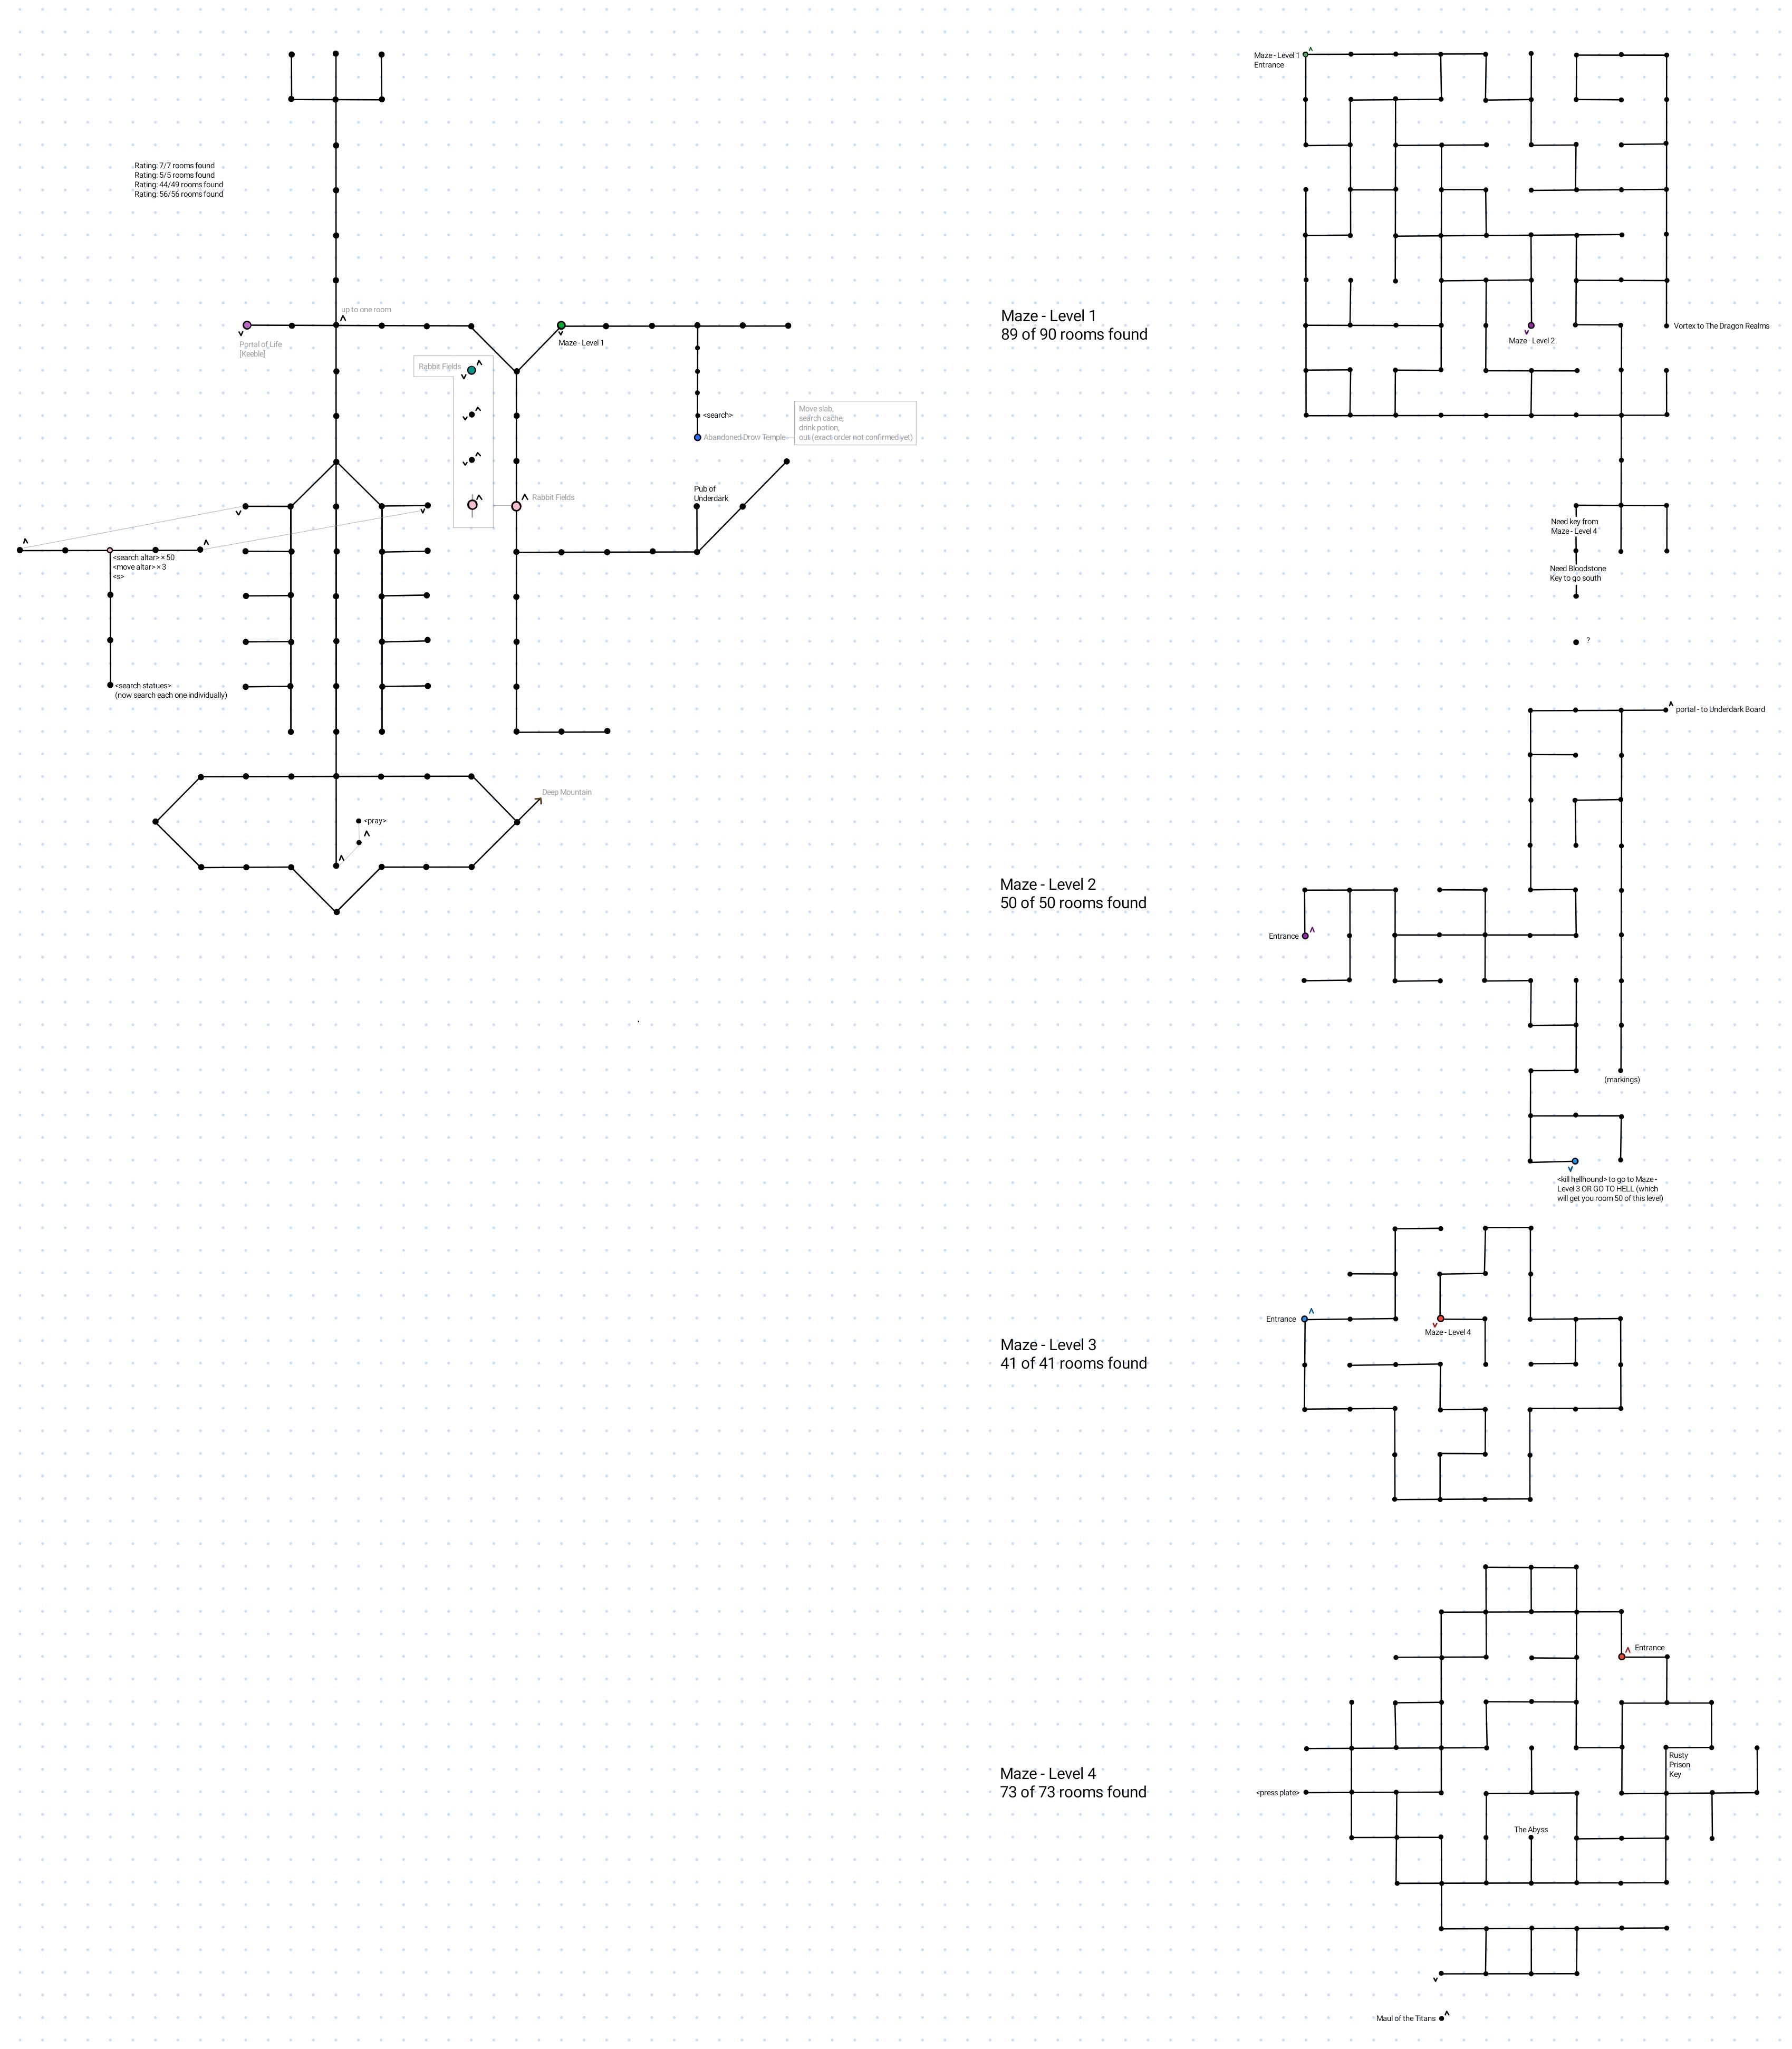 Map of The Drow Kingdom of fe dar Shad